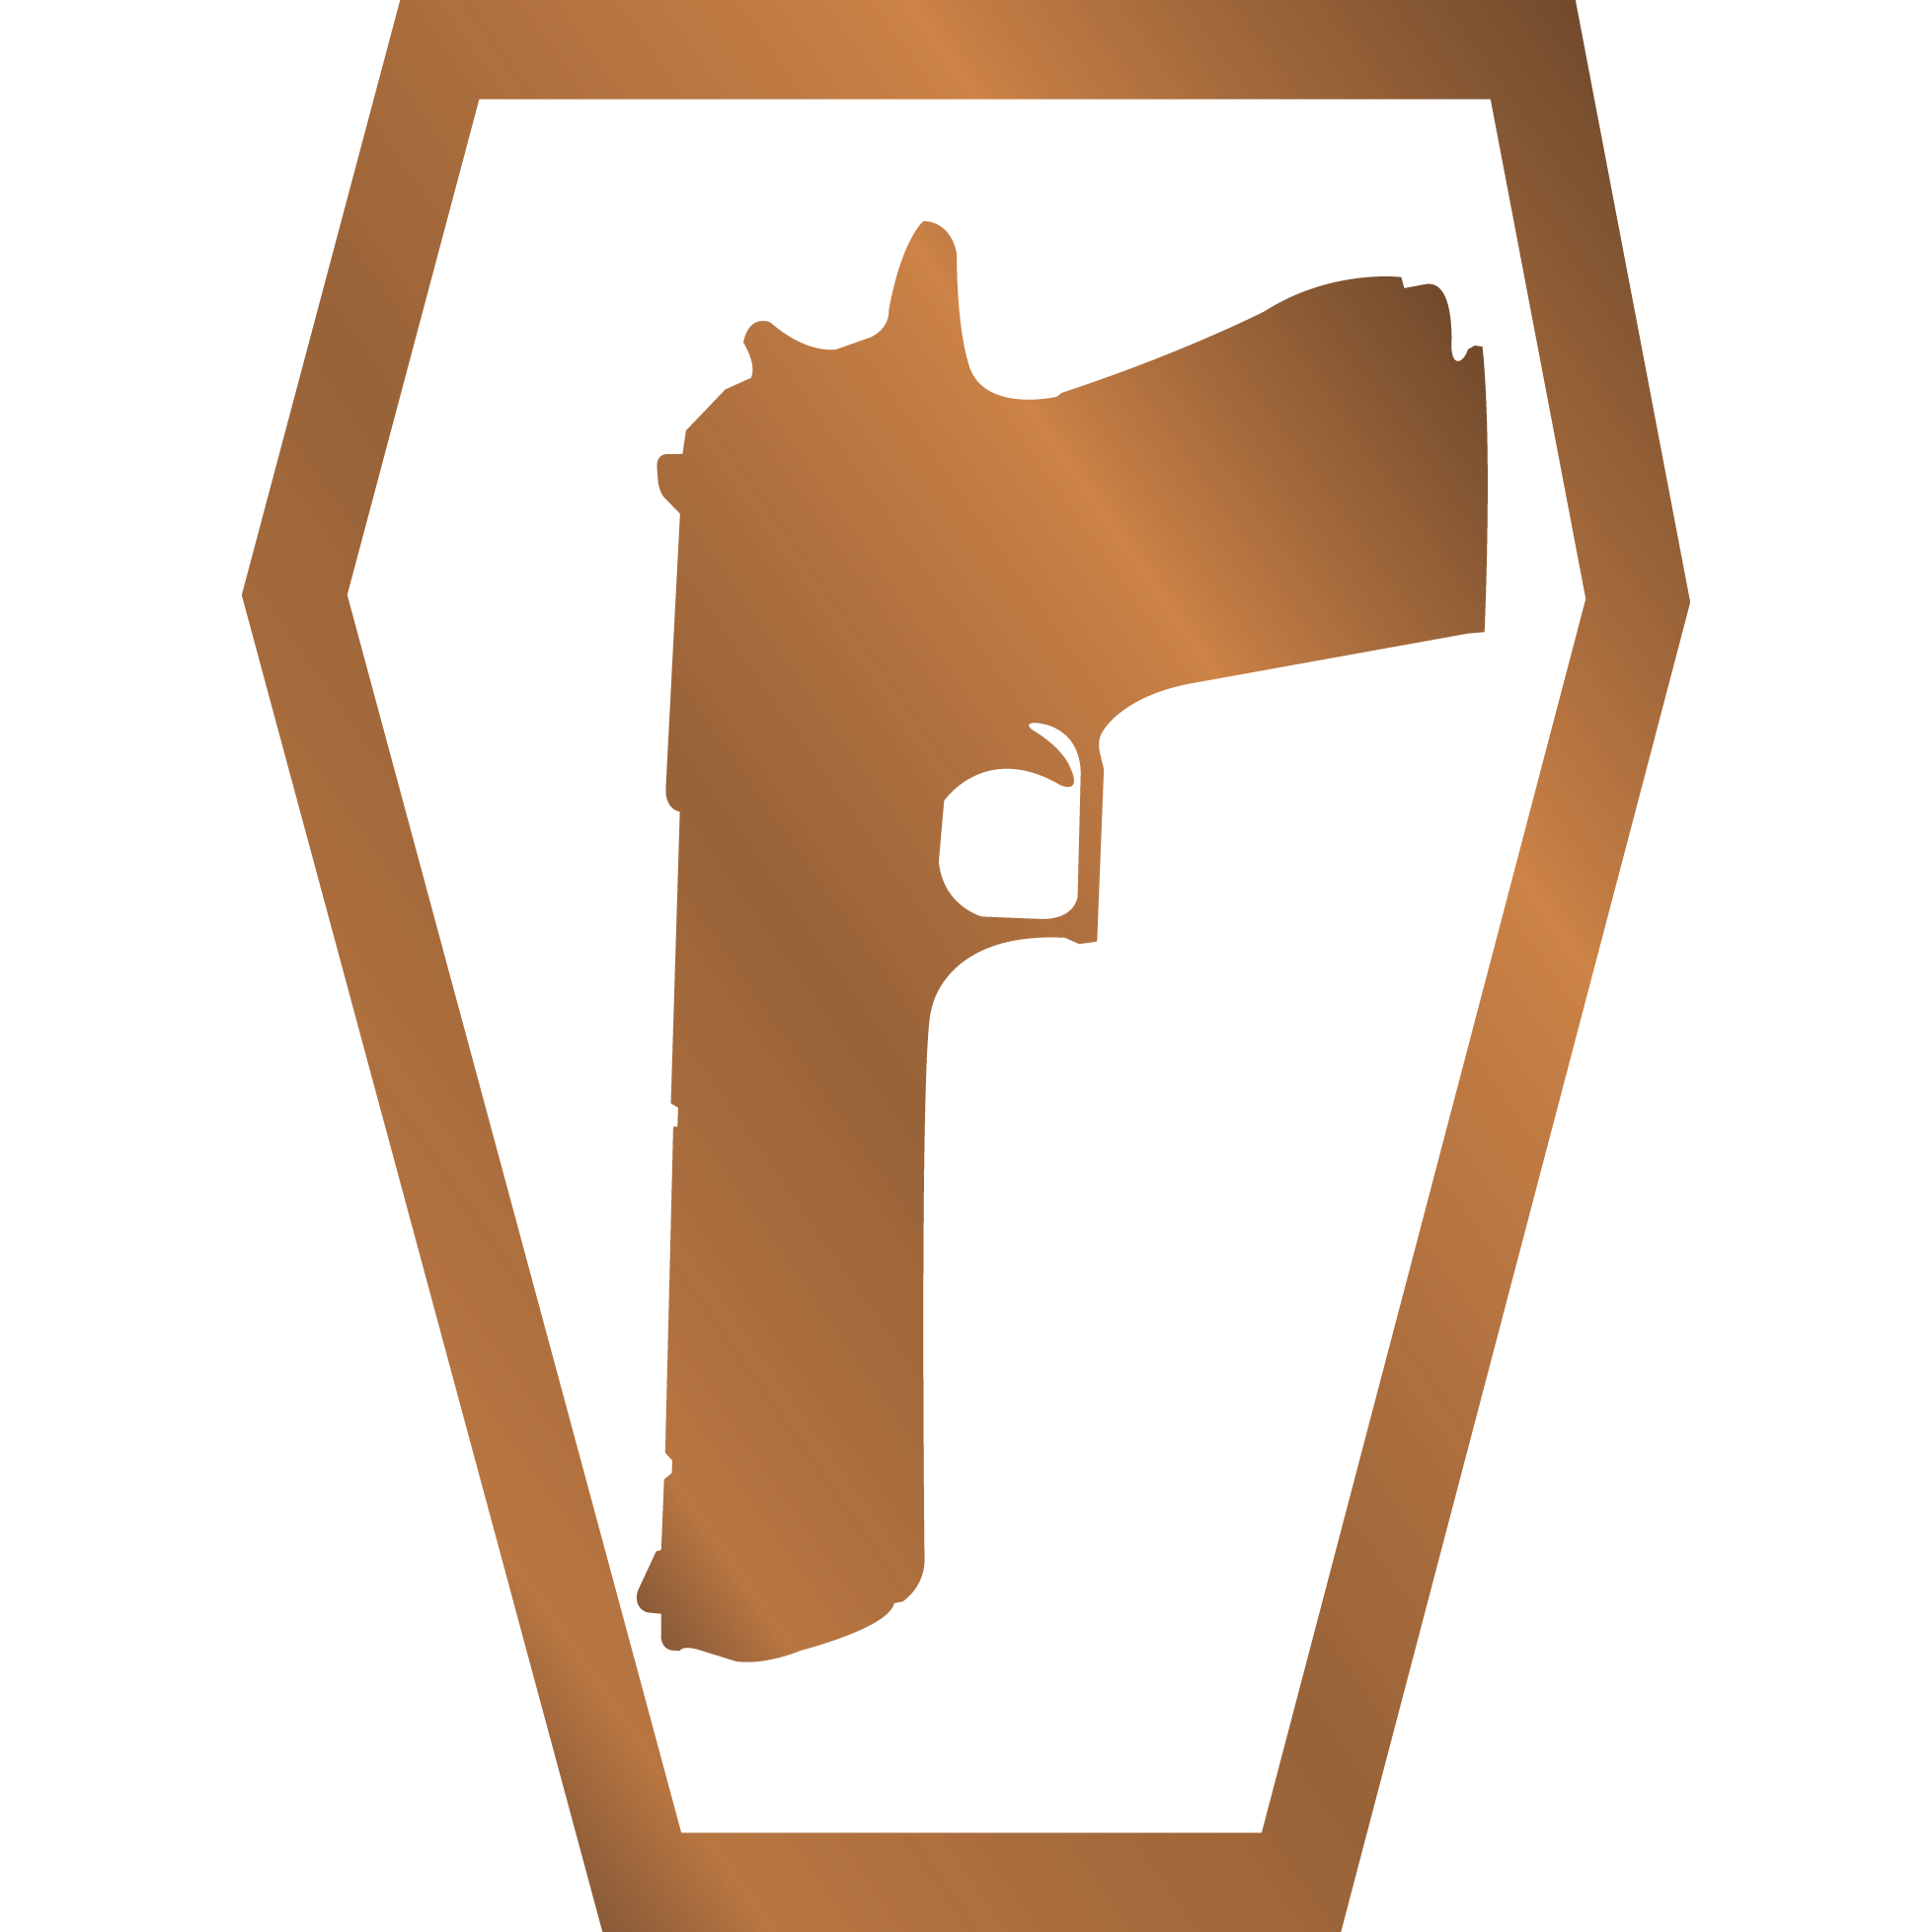 Urbanholster Charter Arms semi-auto UC Lite  38 SPL Revolver Brown No Laser  No Rail Laser G2 (Saddle Grade) Trooper